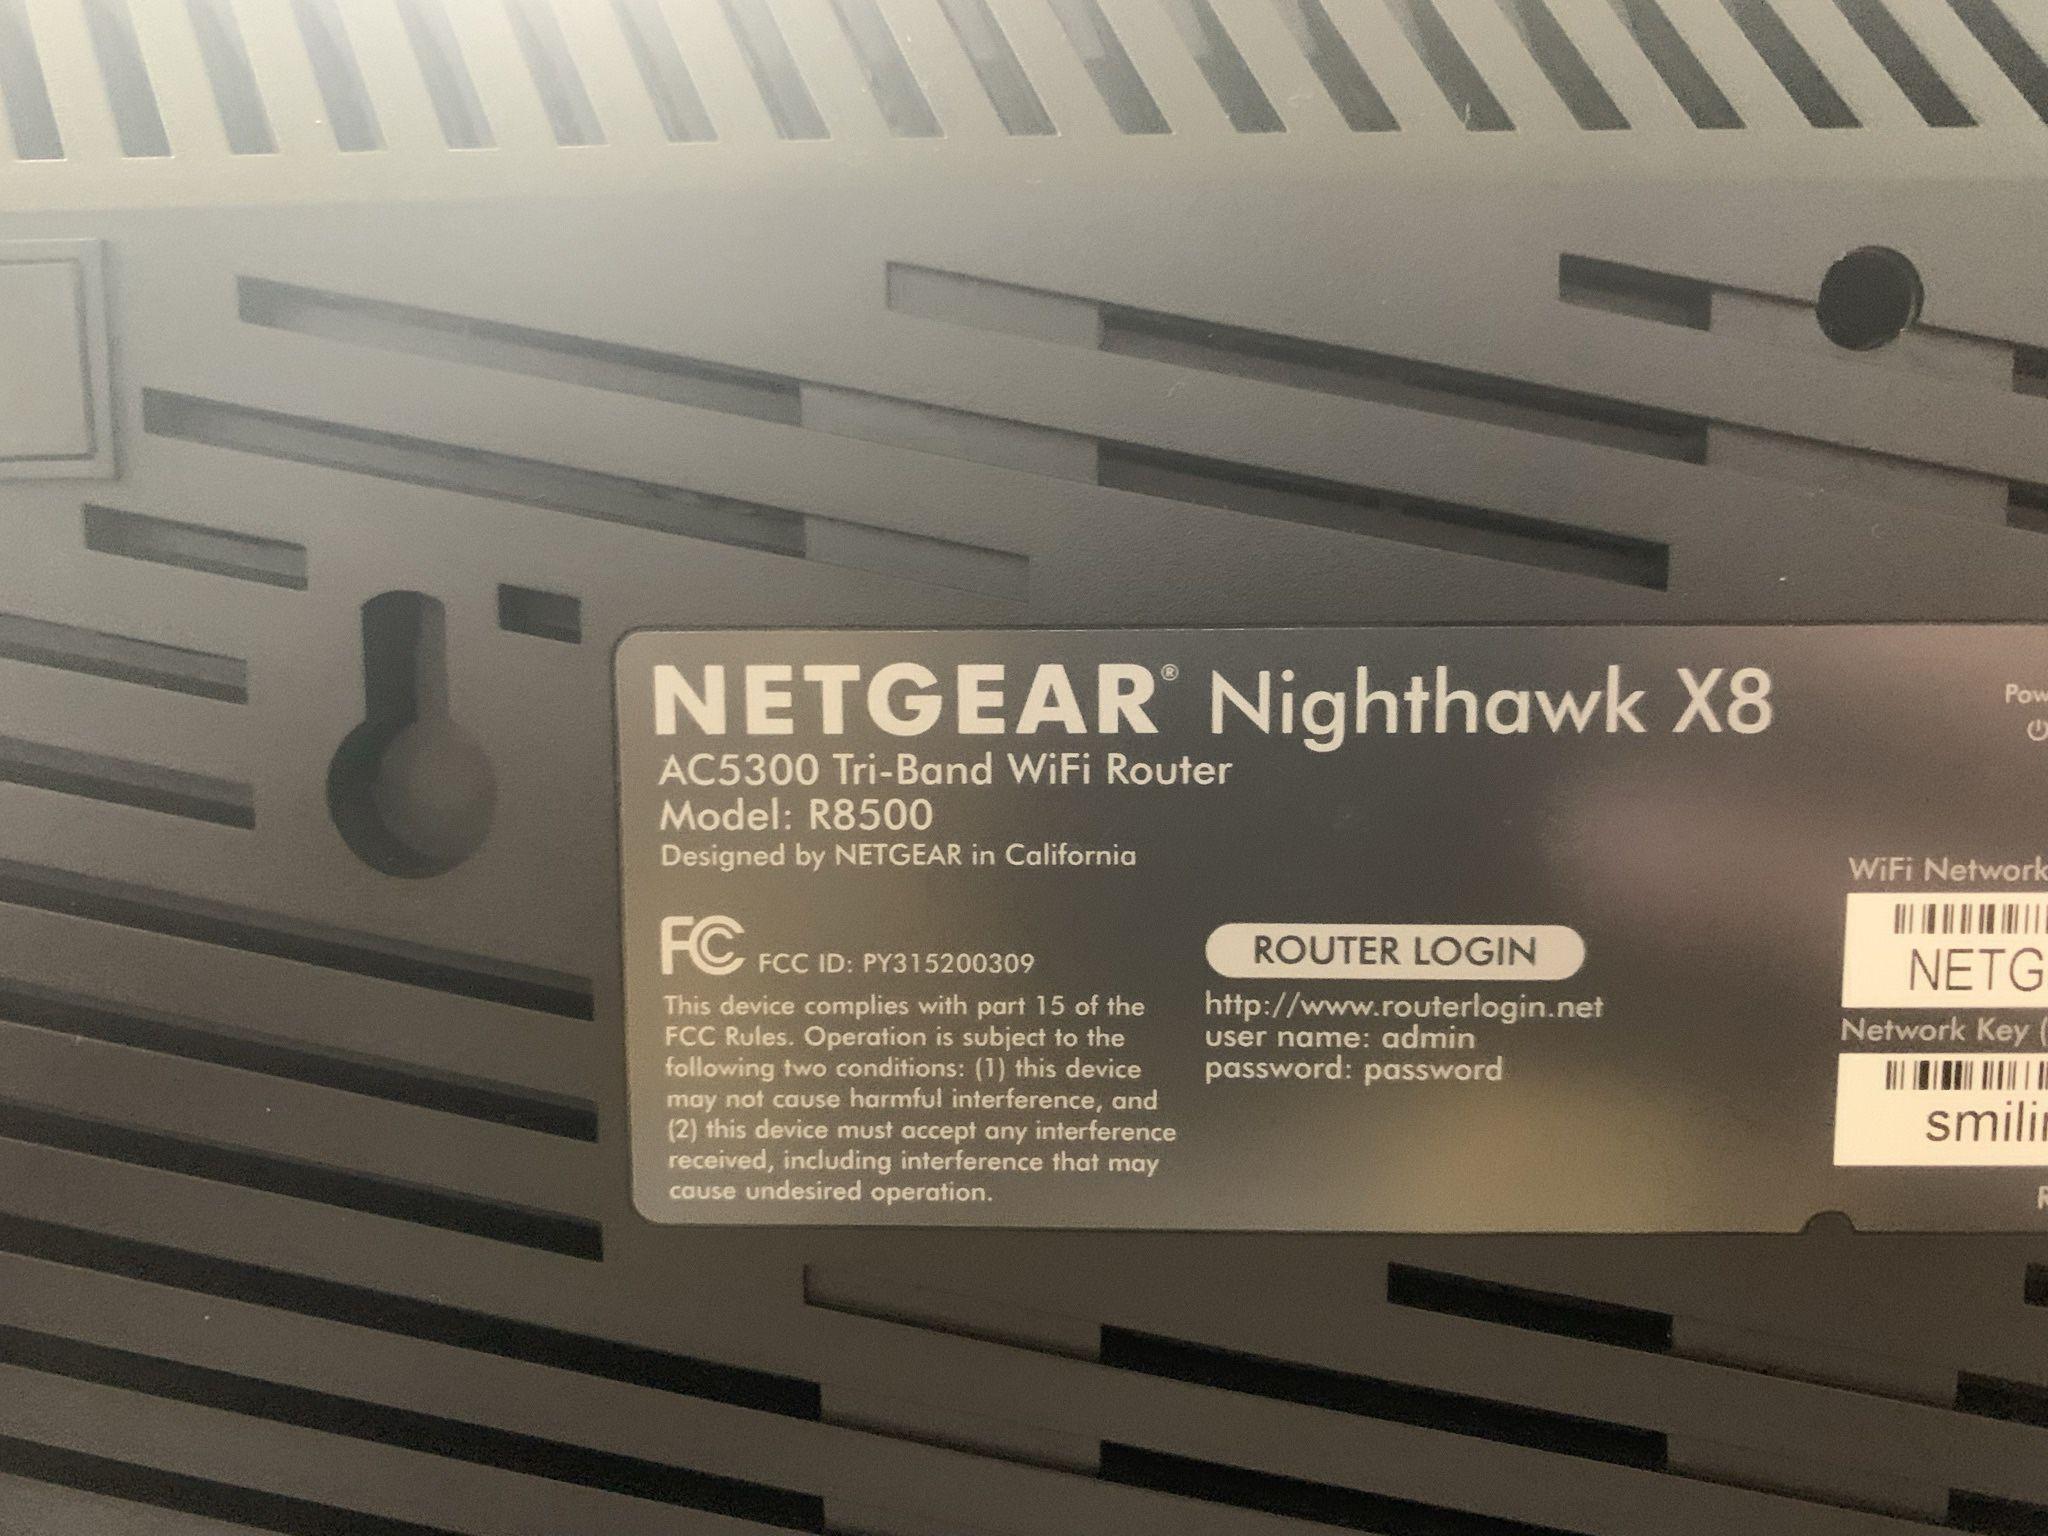 Netgear Nighthawk X8